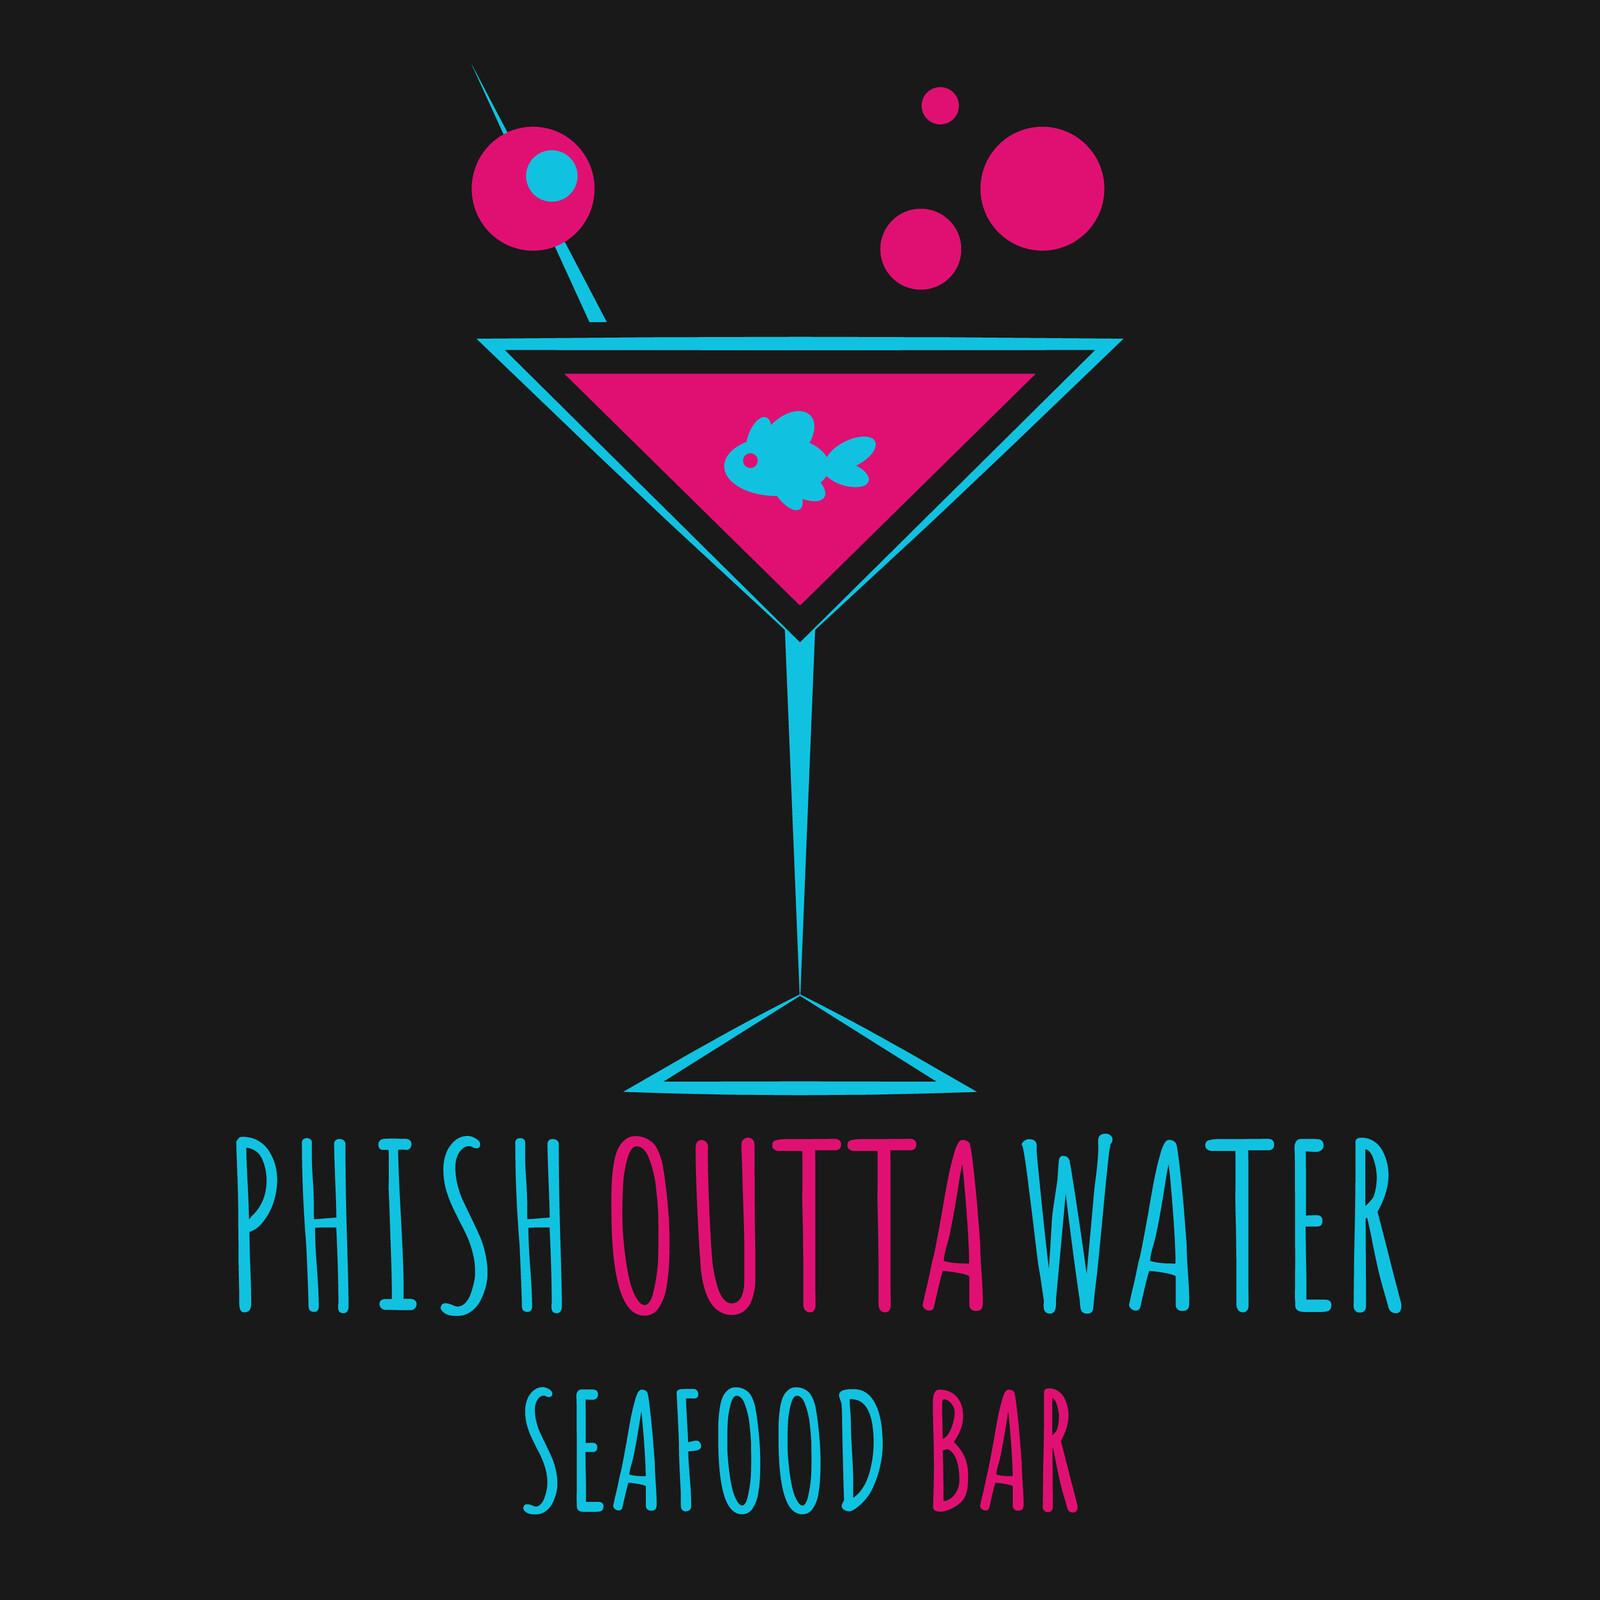 Phish Outta Water Logo